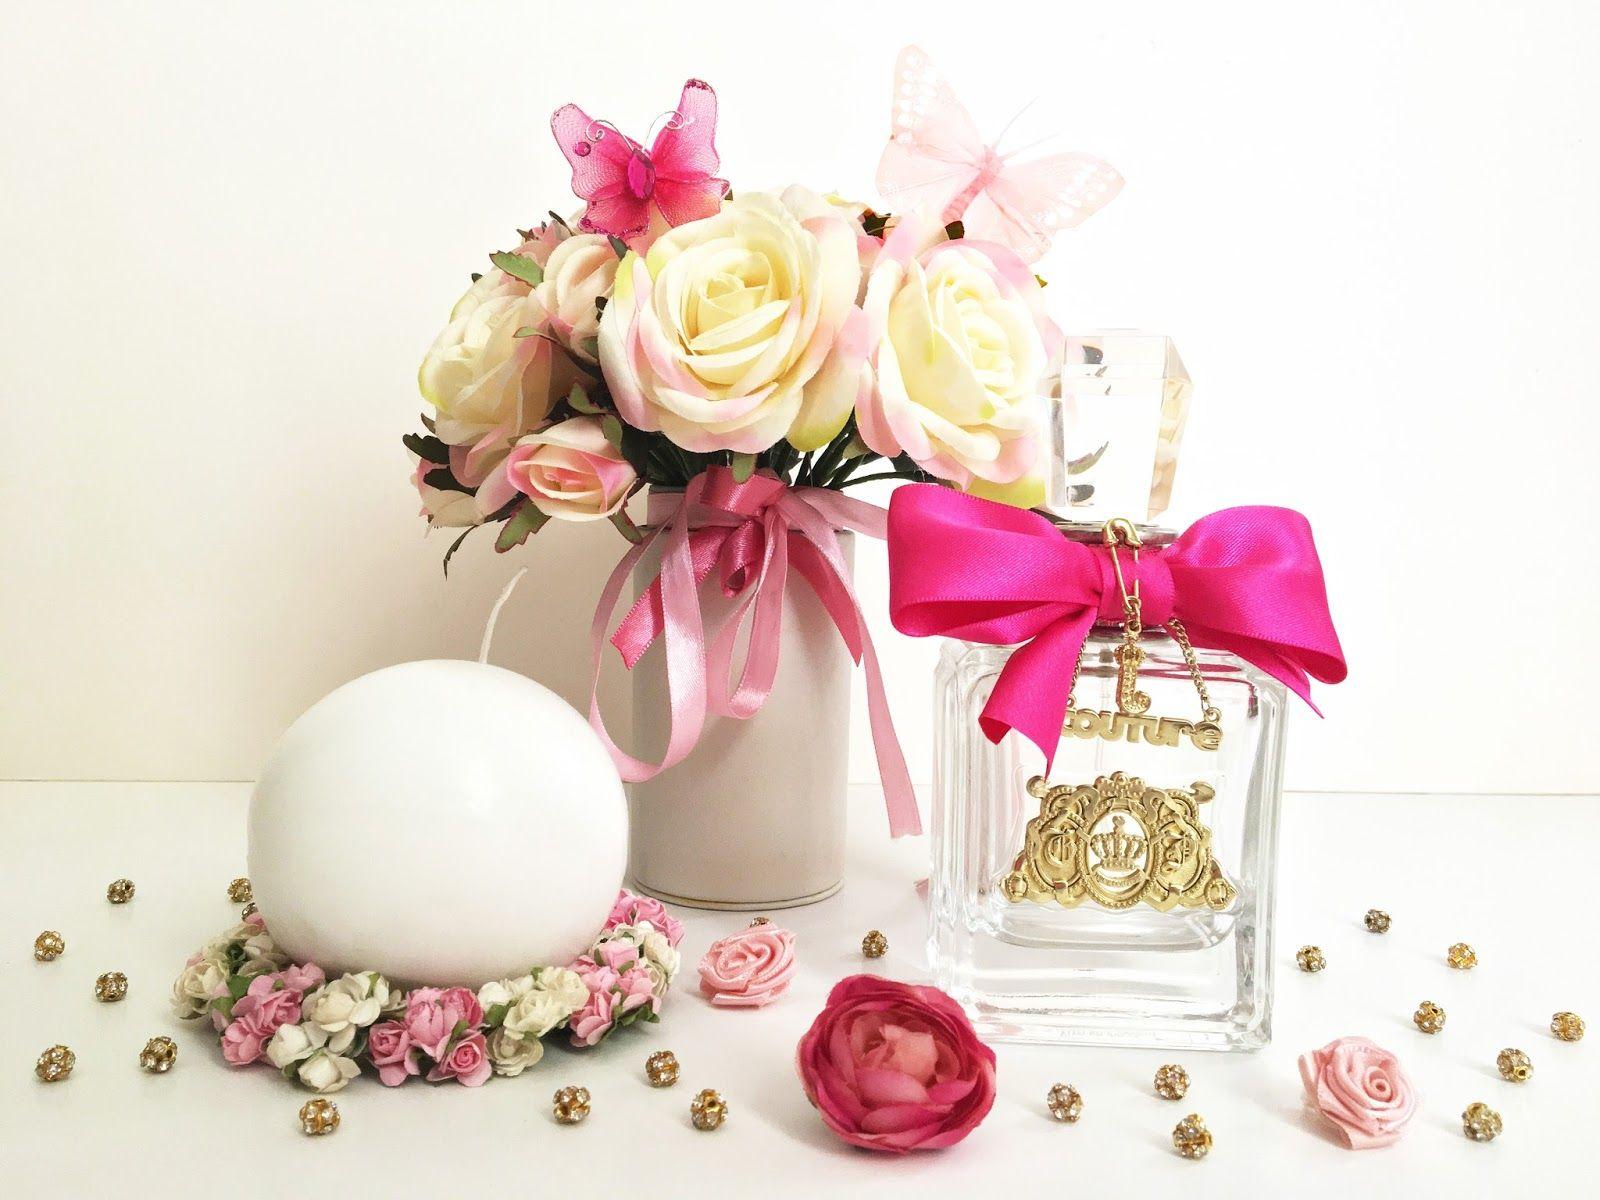 Juicy Couture Viva La Juicy Perfume Review http ...